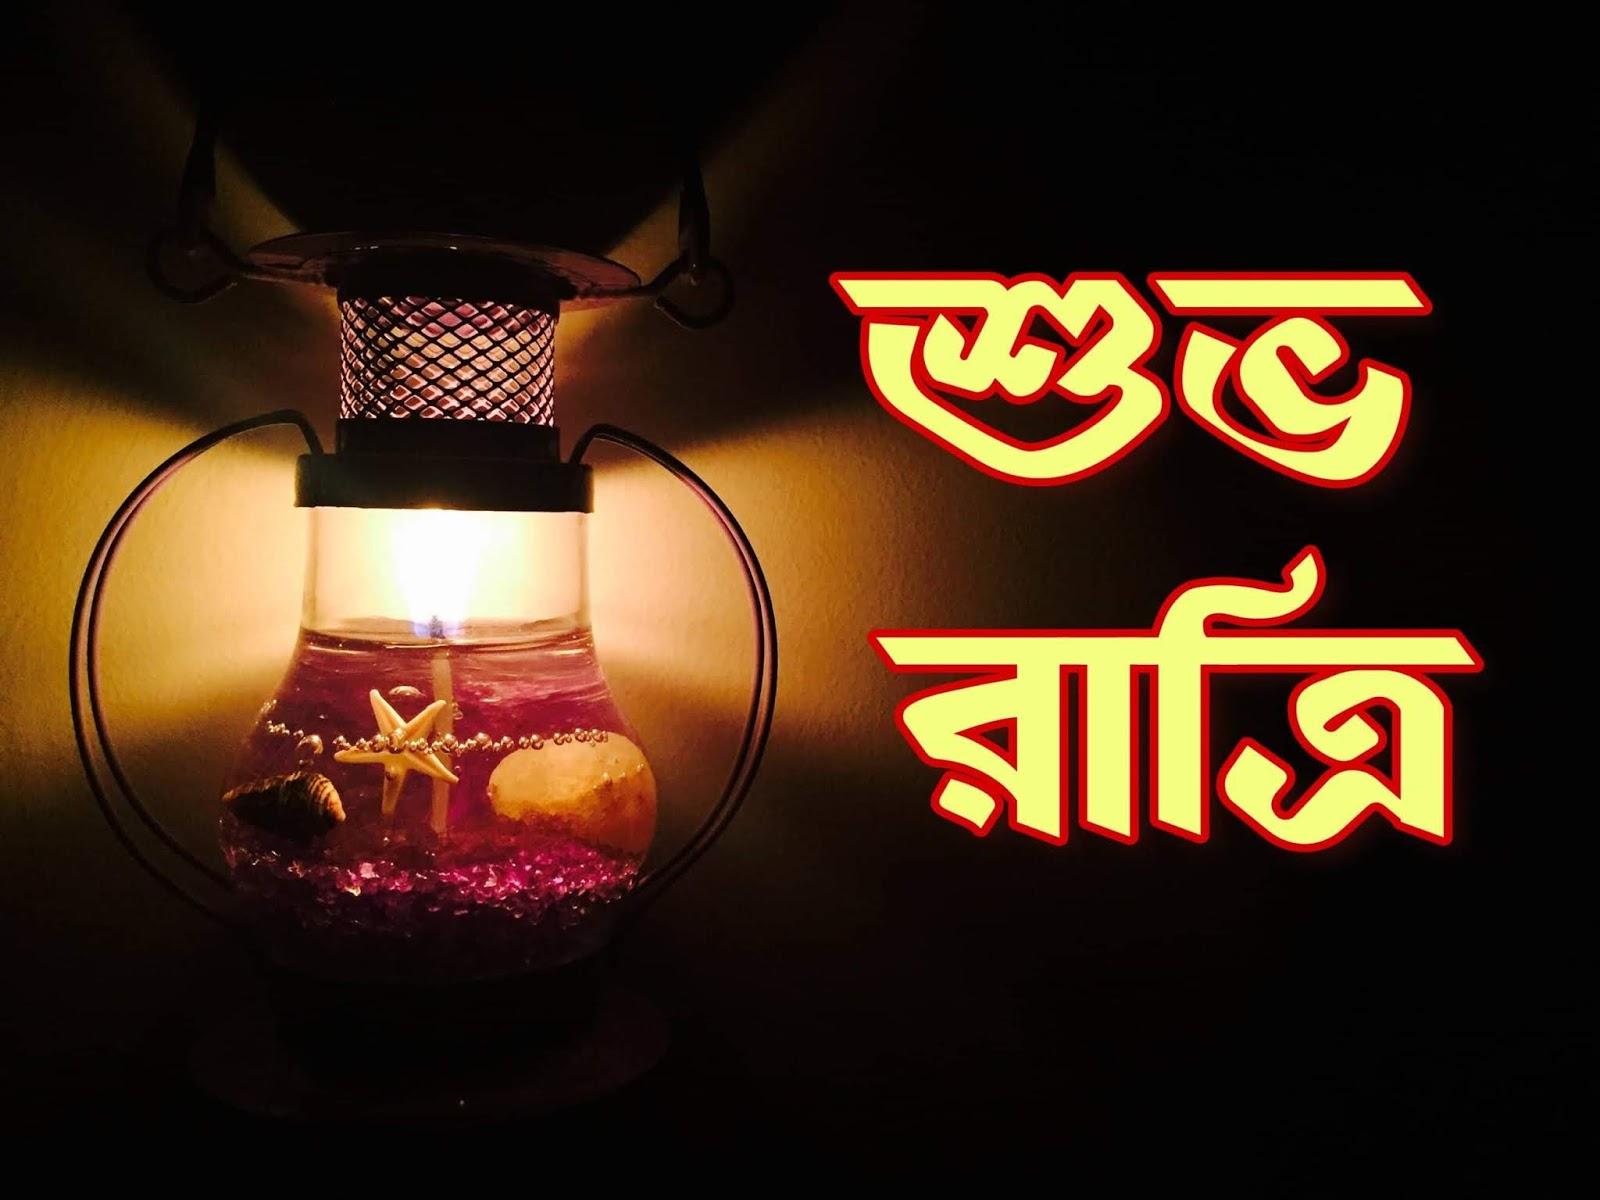 Good Night Image Bangla Subho Ratri Image Download Good Night Pic Bengali 1600x1200 Download Hd Wallpaper Wallpapertip